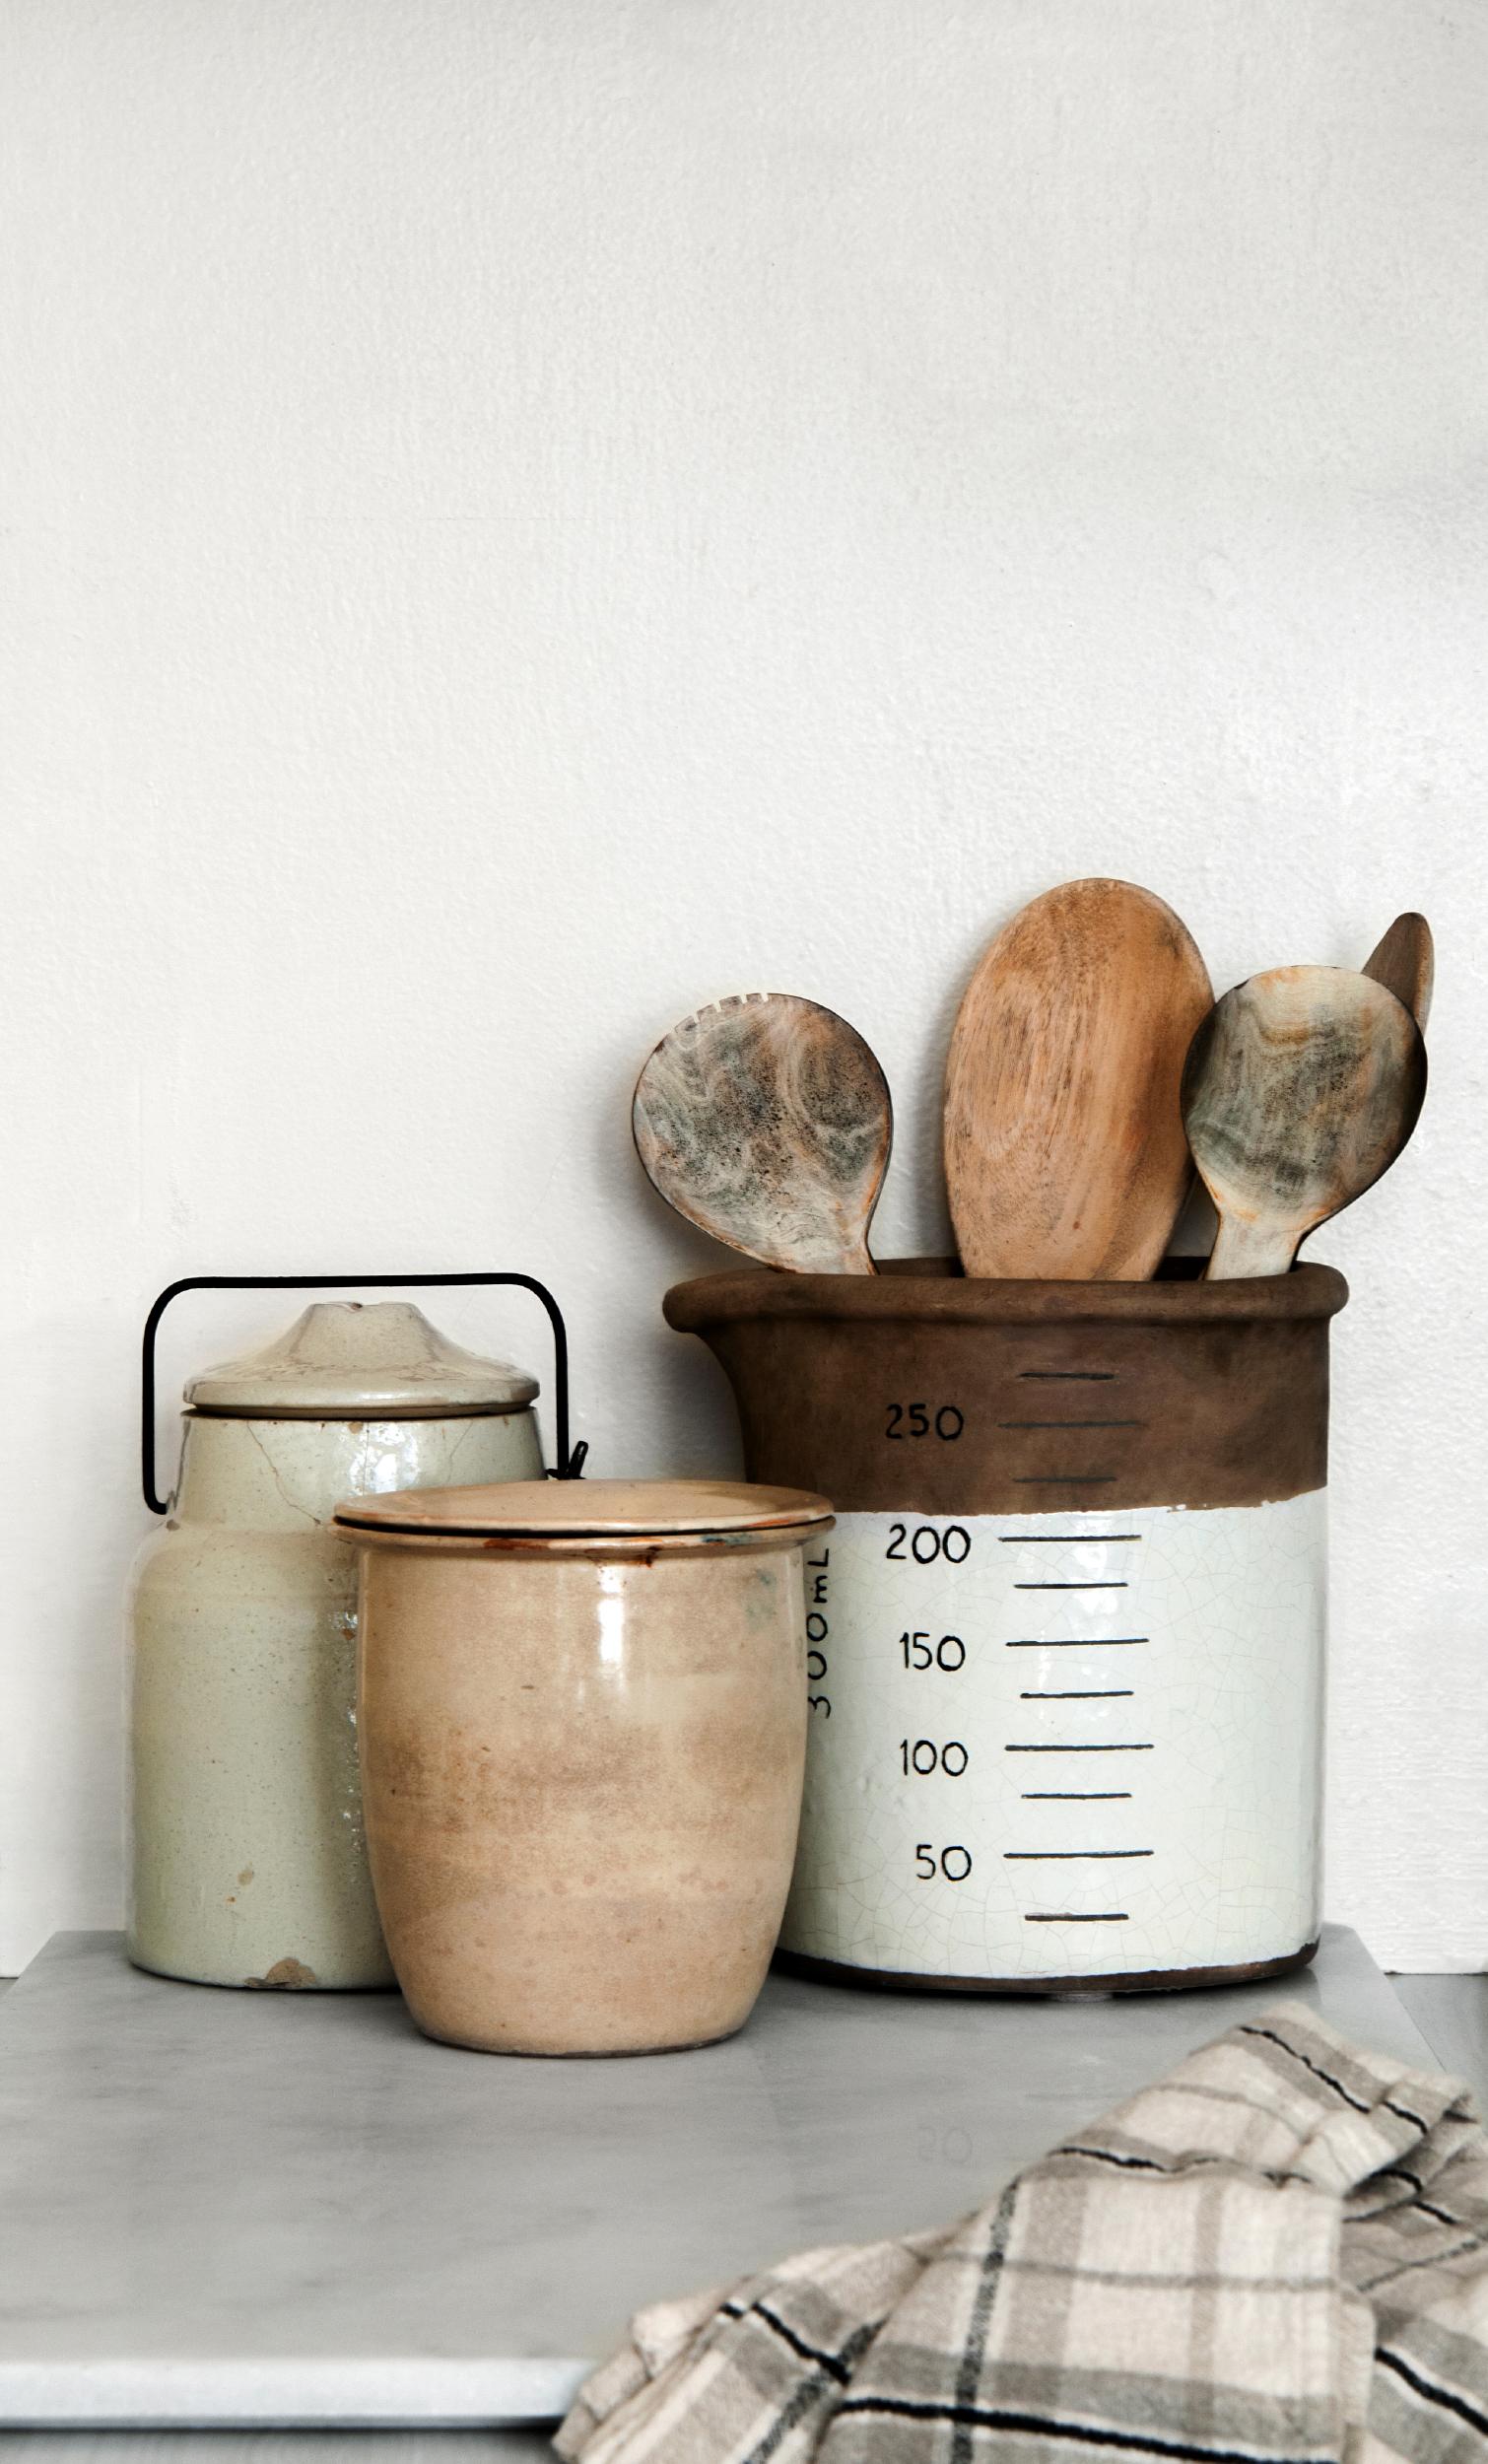 Utensils and Jars